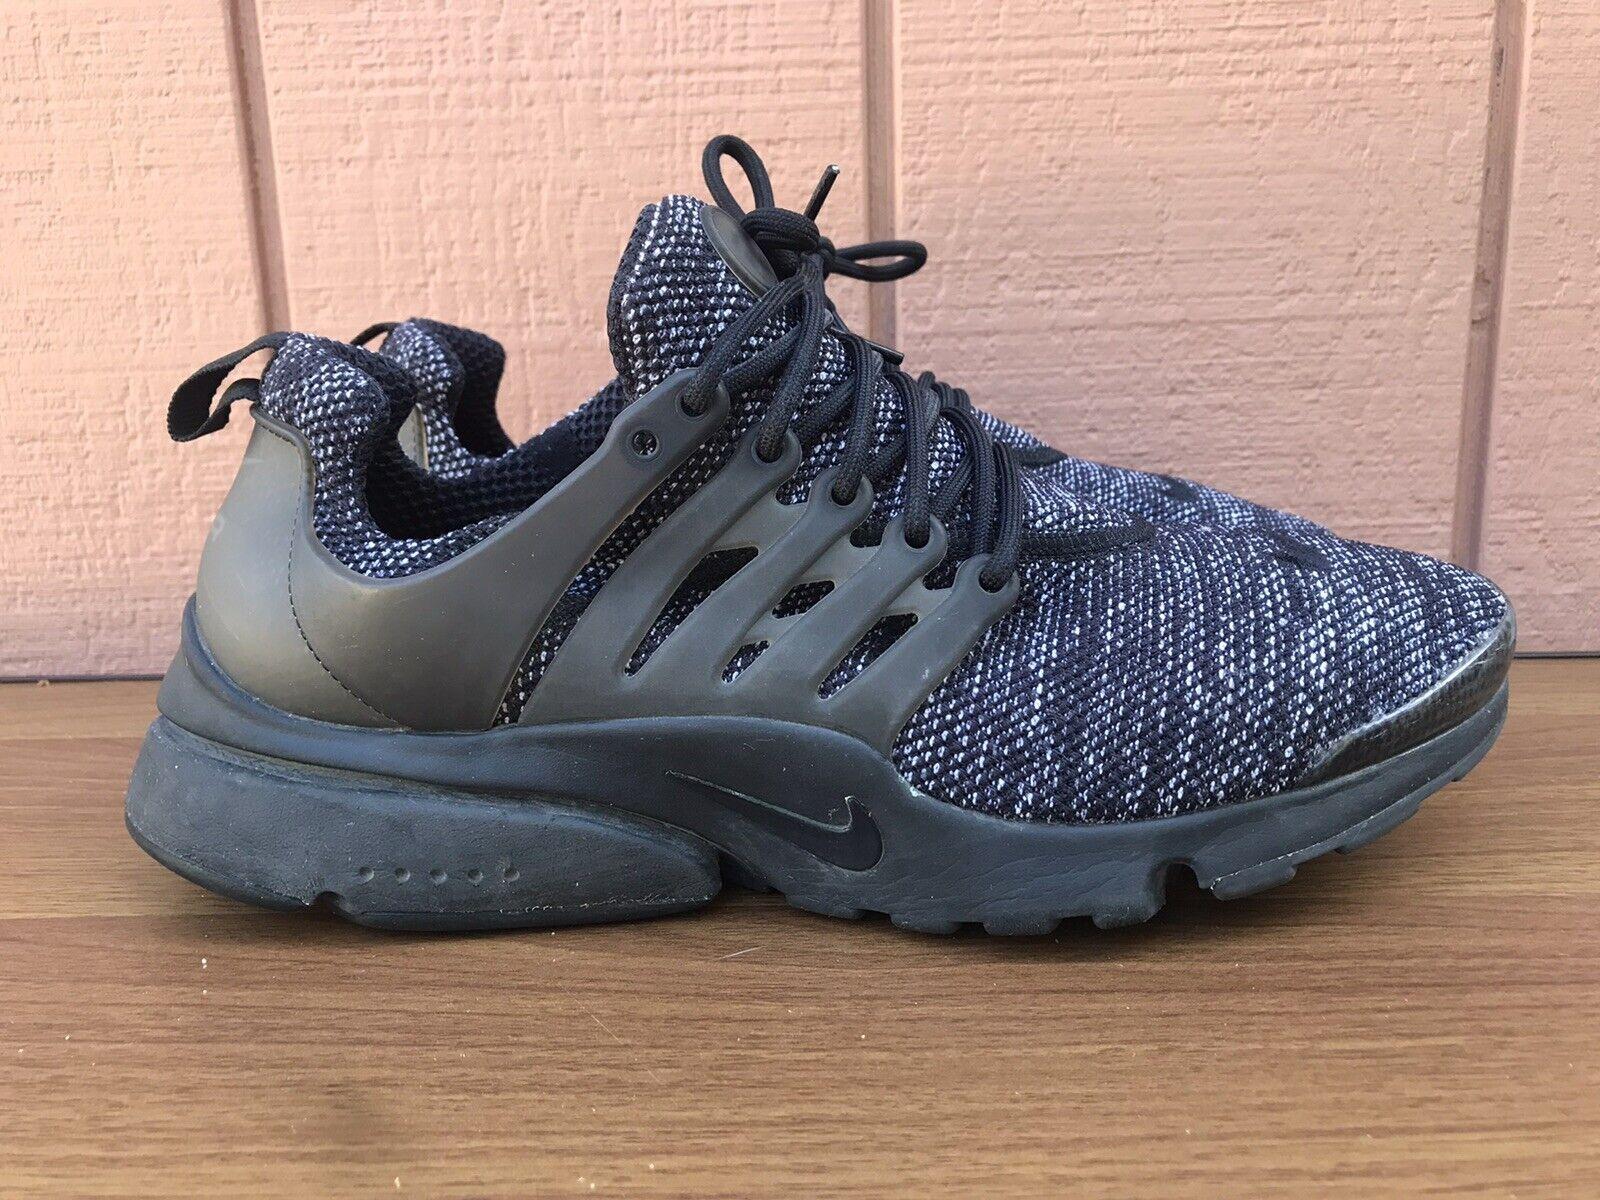 EUC Nike Air Presto Ultra BR Men's US 10 Running Shoes Black Gray 898020-001 C7